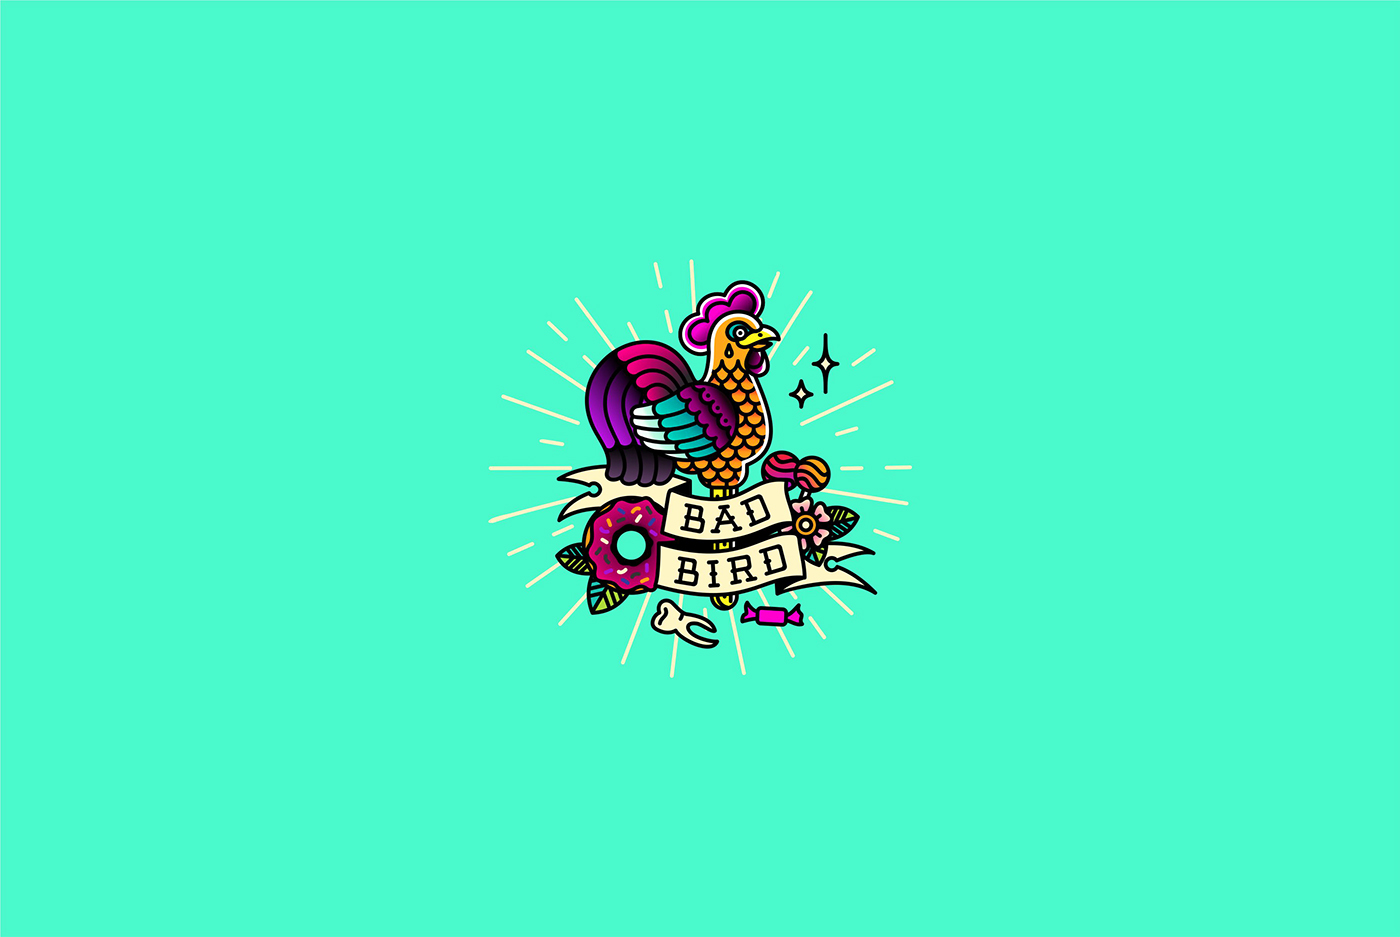 tatoo tatoo-salon logo Logotype linework lollipop cock Rooster old school badbirdink